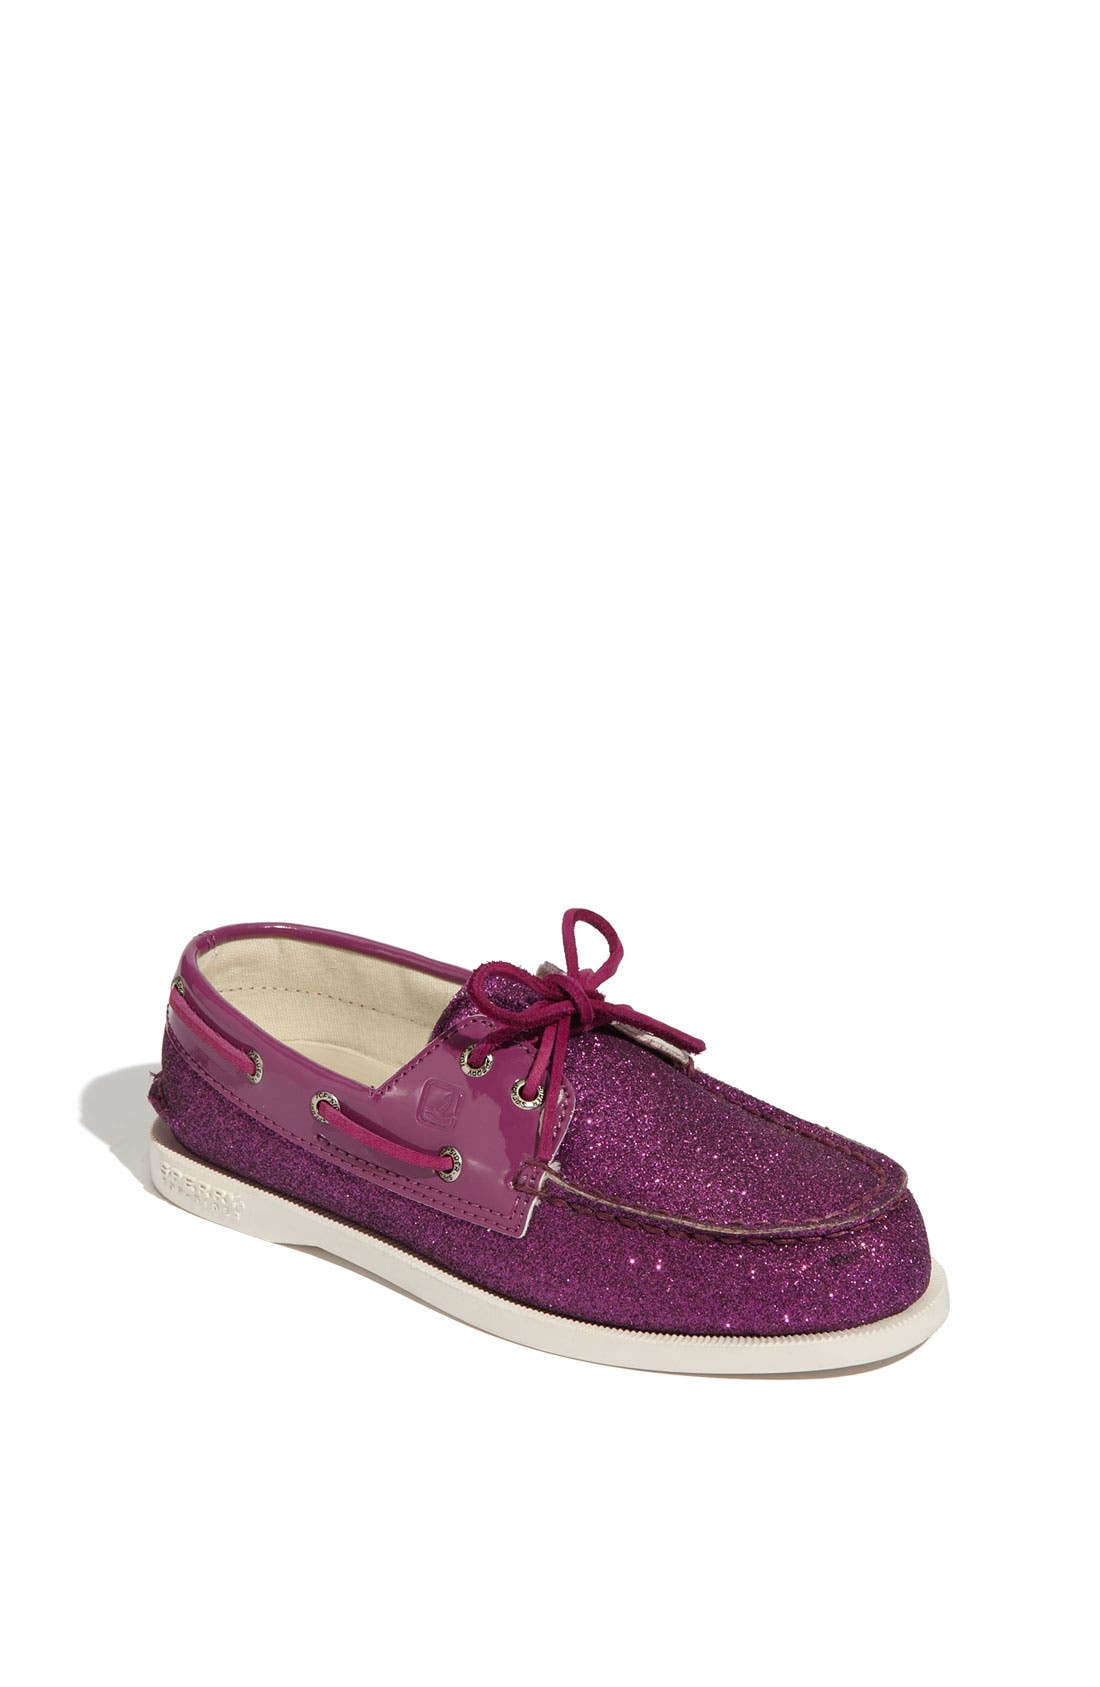 Main Image - Sperry Top-Sider® 'Authentic Original' Glitter Boat Shoe (Toddler, Little Kid & Big Kid)